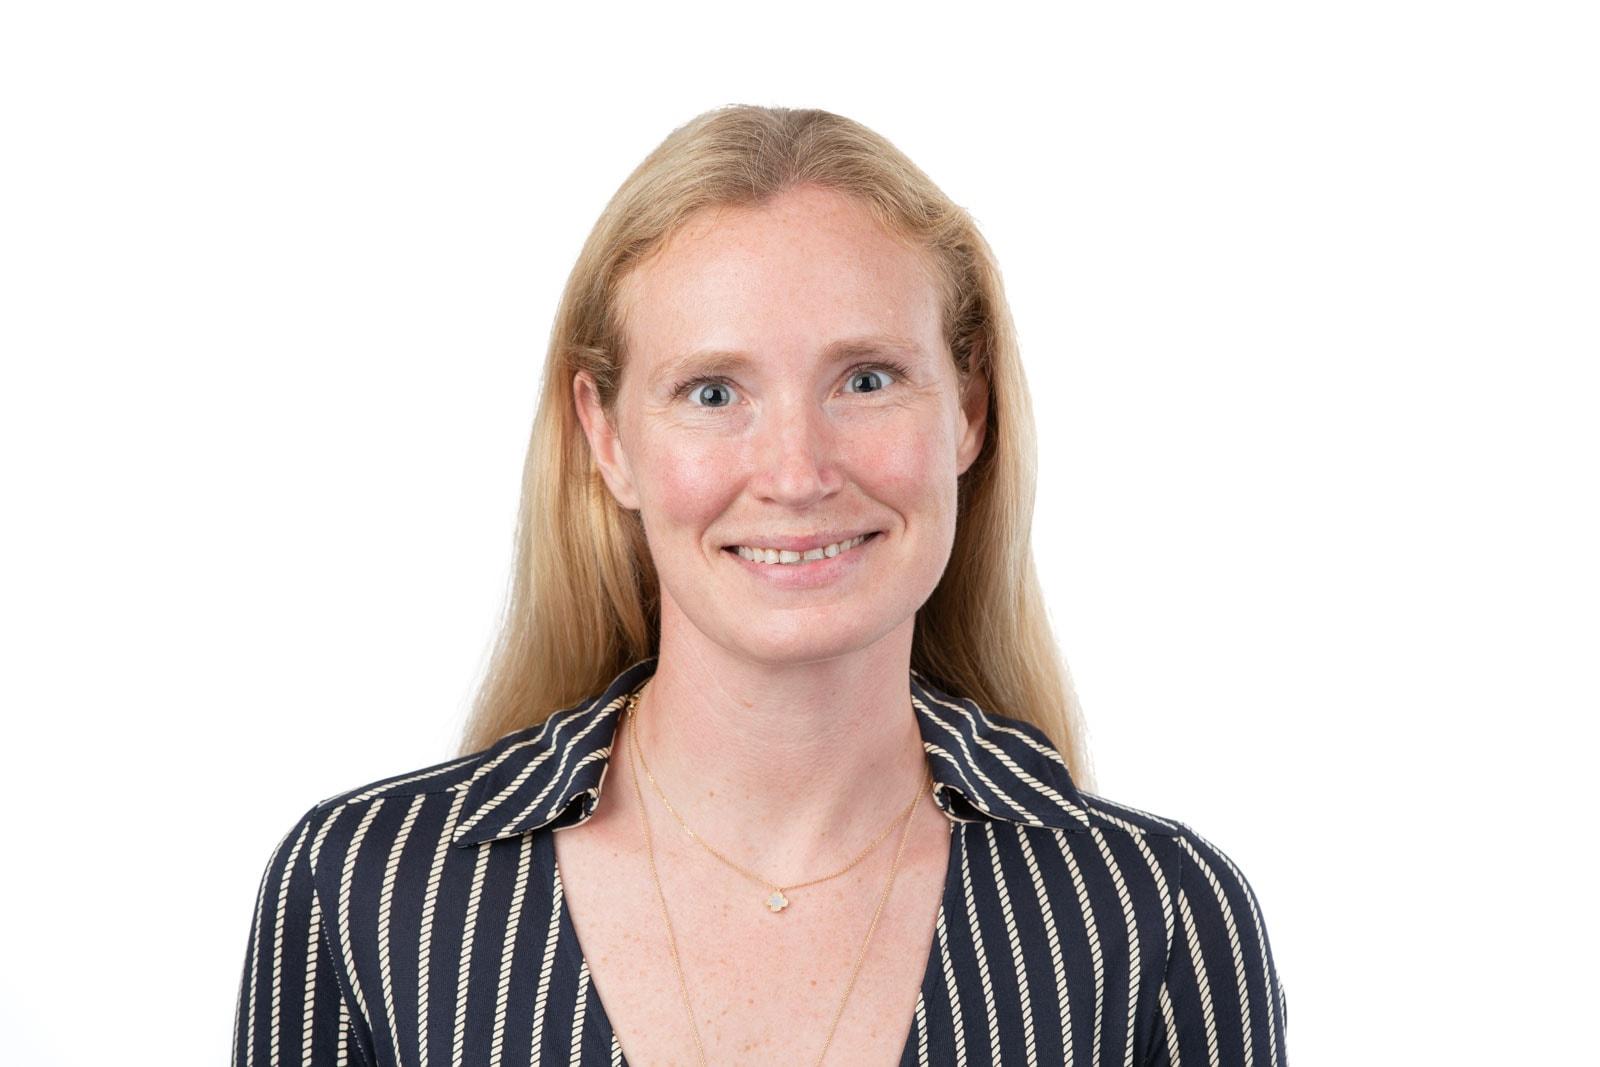 Headshot of Jessie Cronan